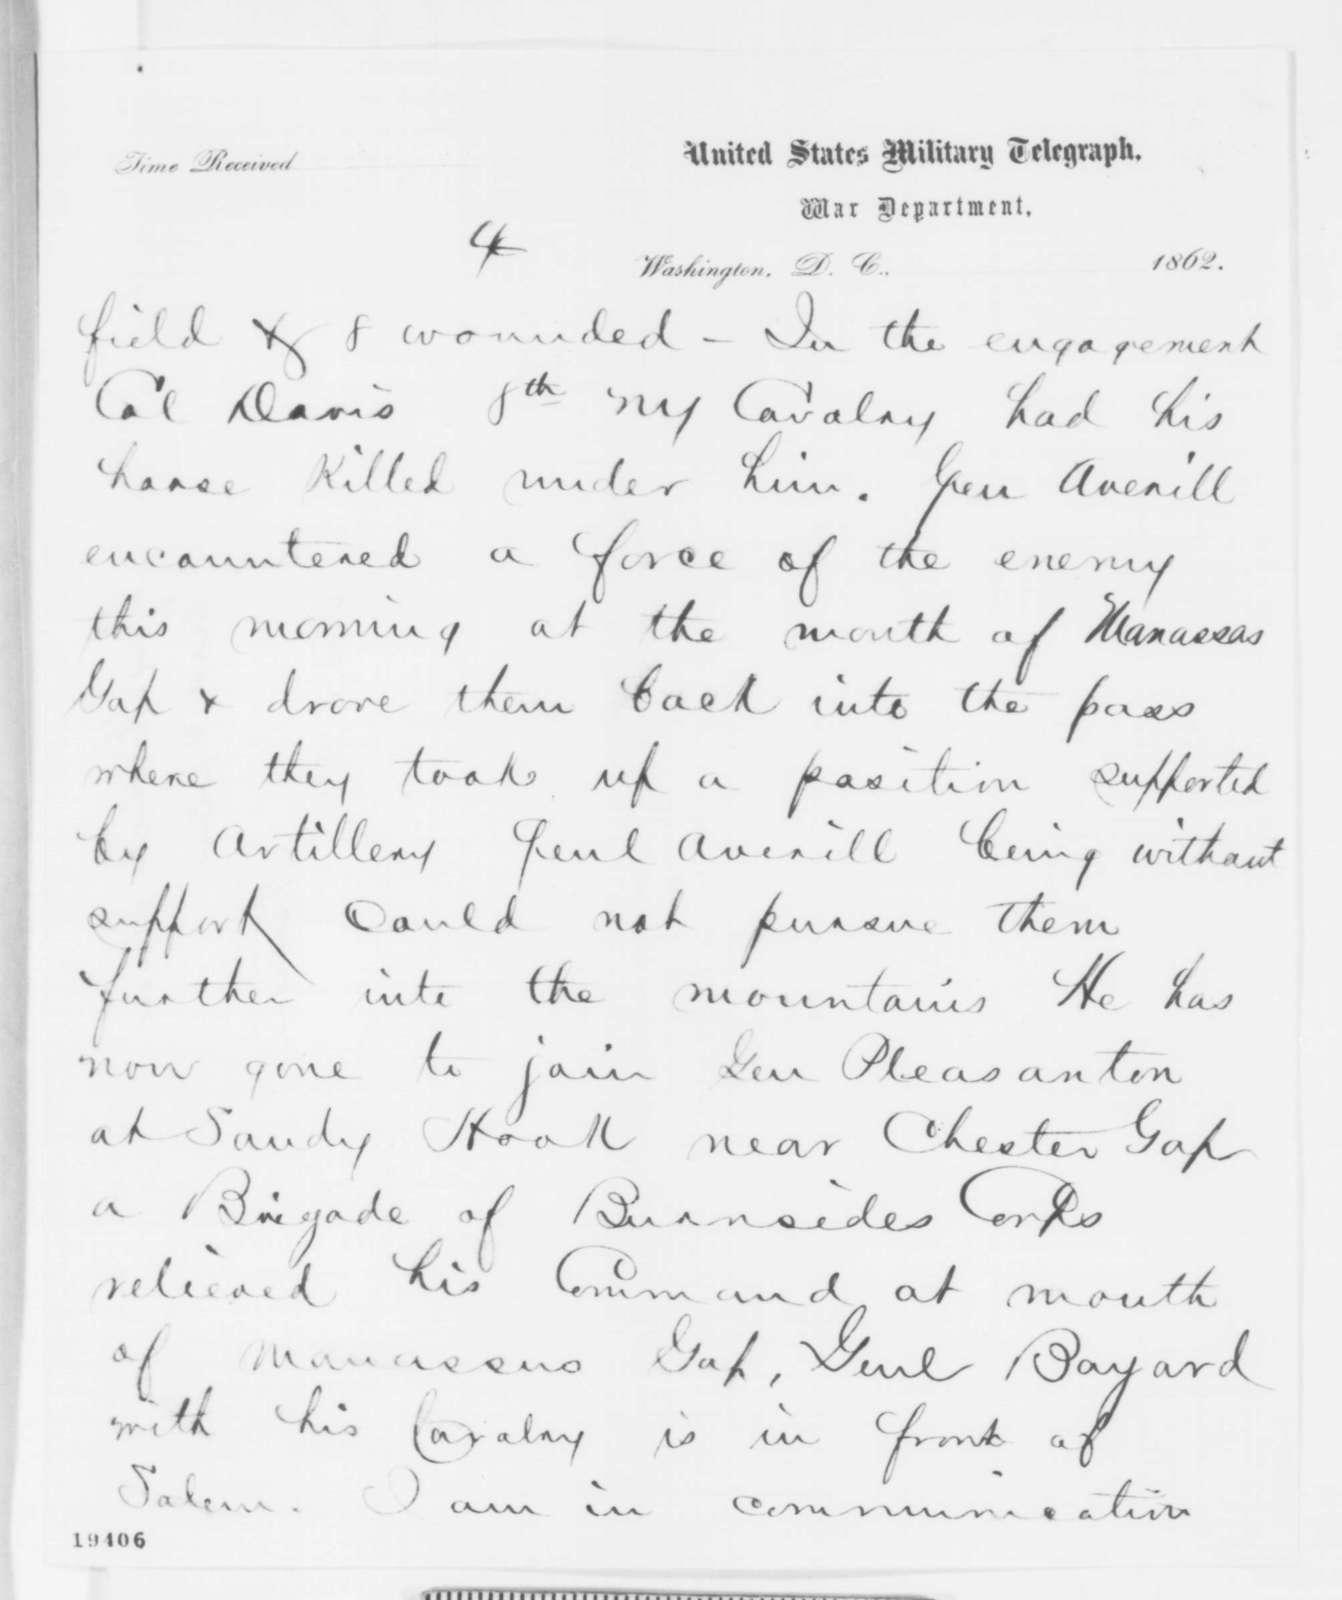 George B. McClellan to Abraham Lincoln, Wednesday, November 05, 1862  (Telegram concerning military affairs)